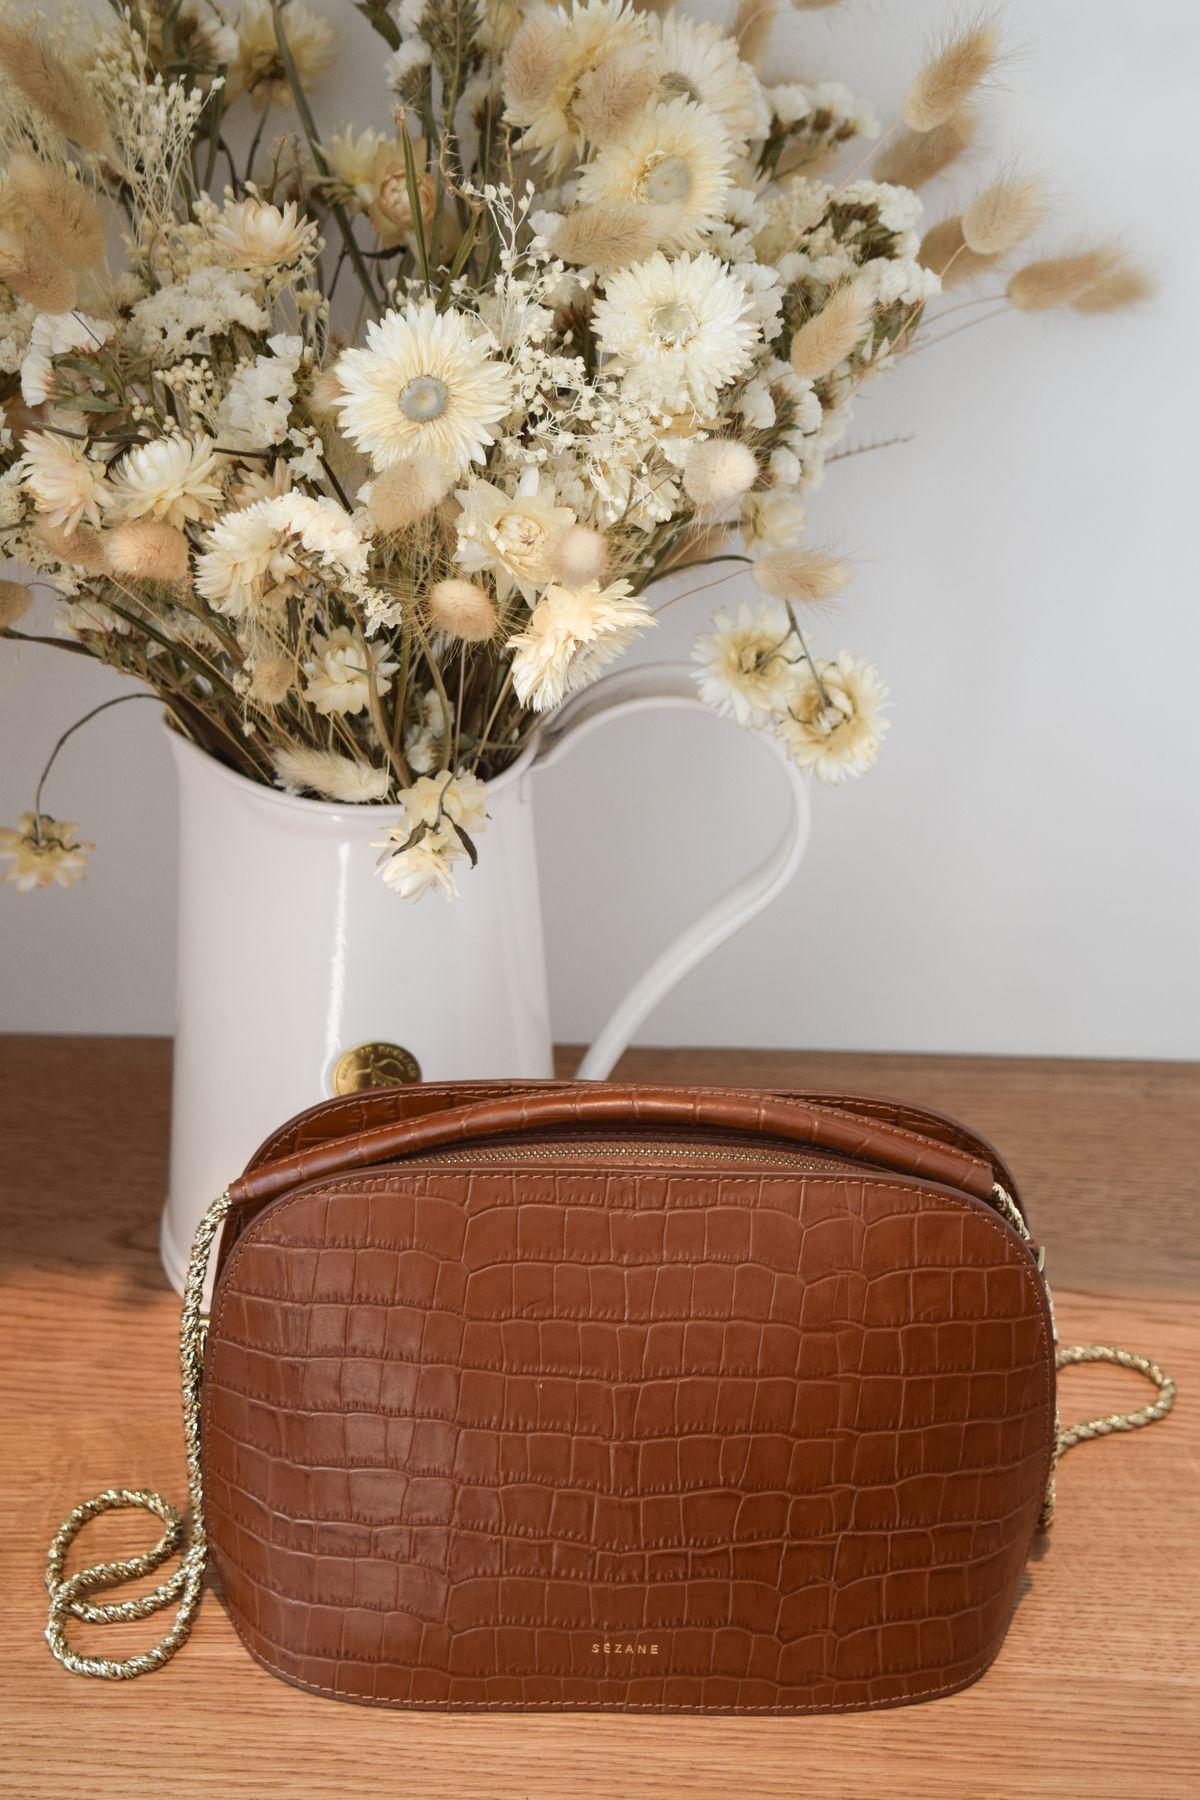 Sézane Fall Leather Bag